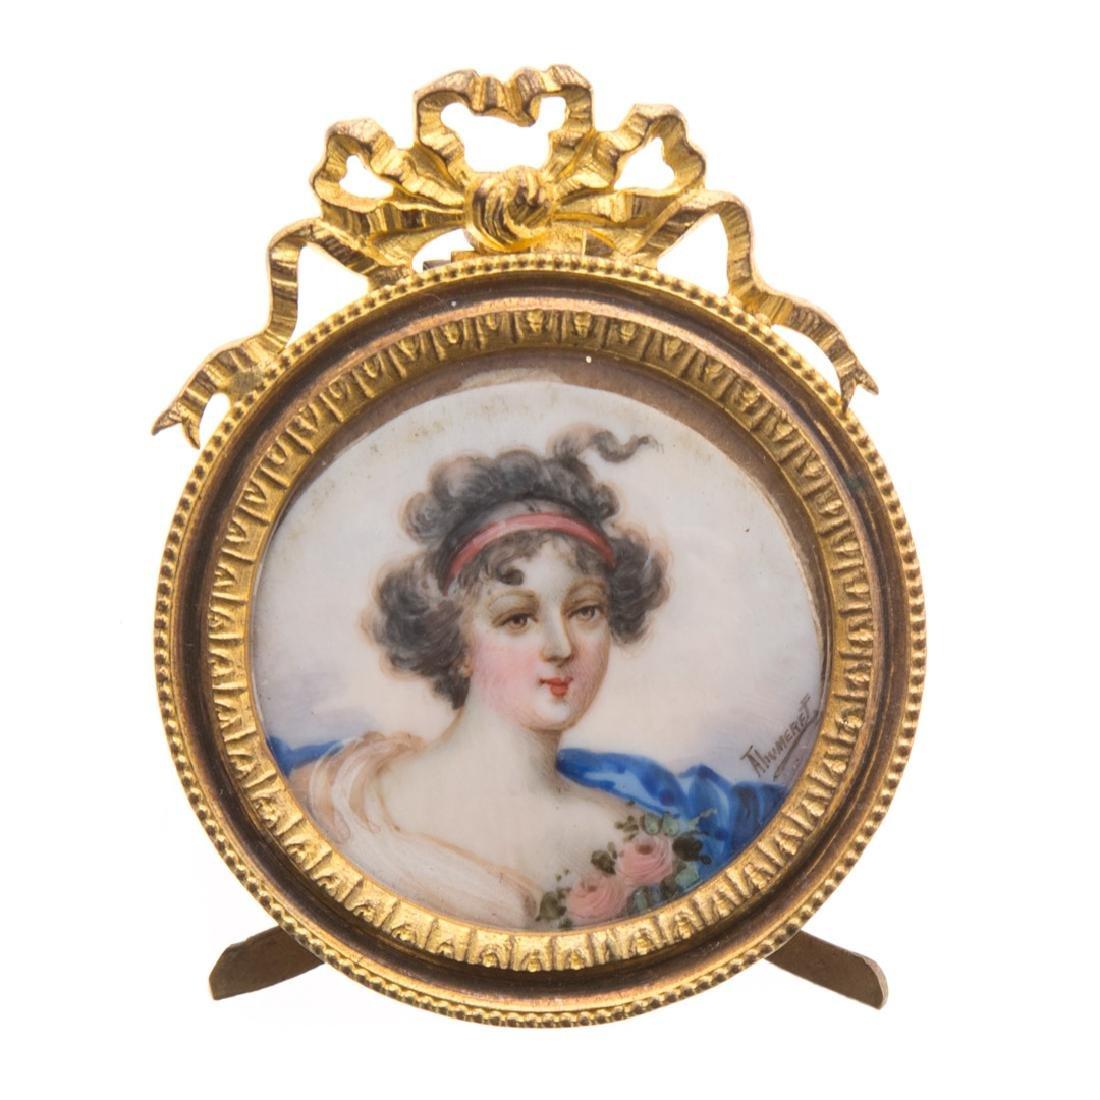 French School 19th century portrait miniature